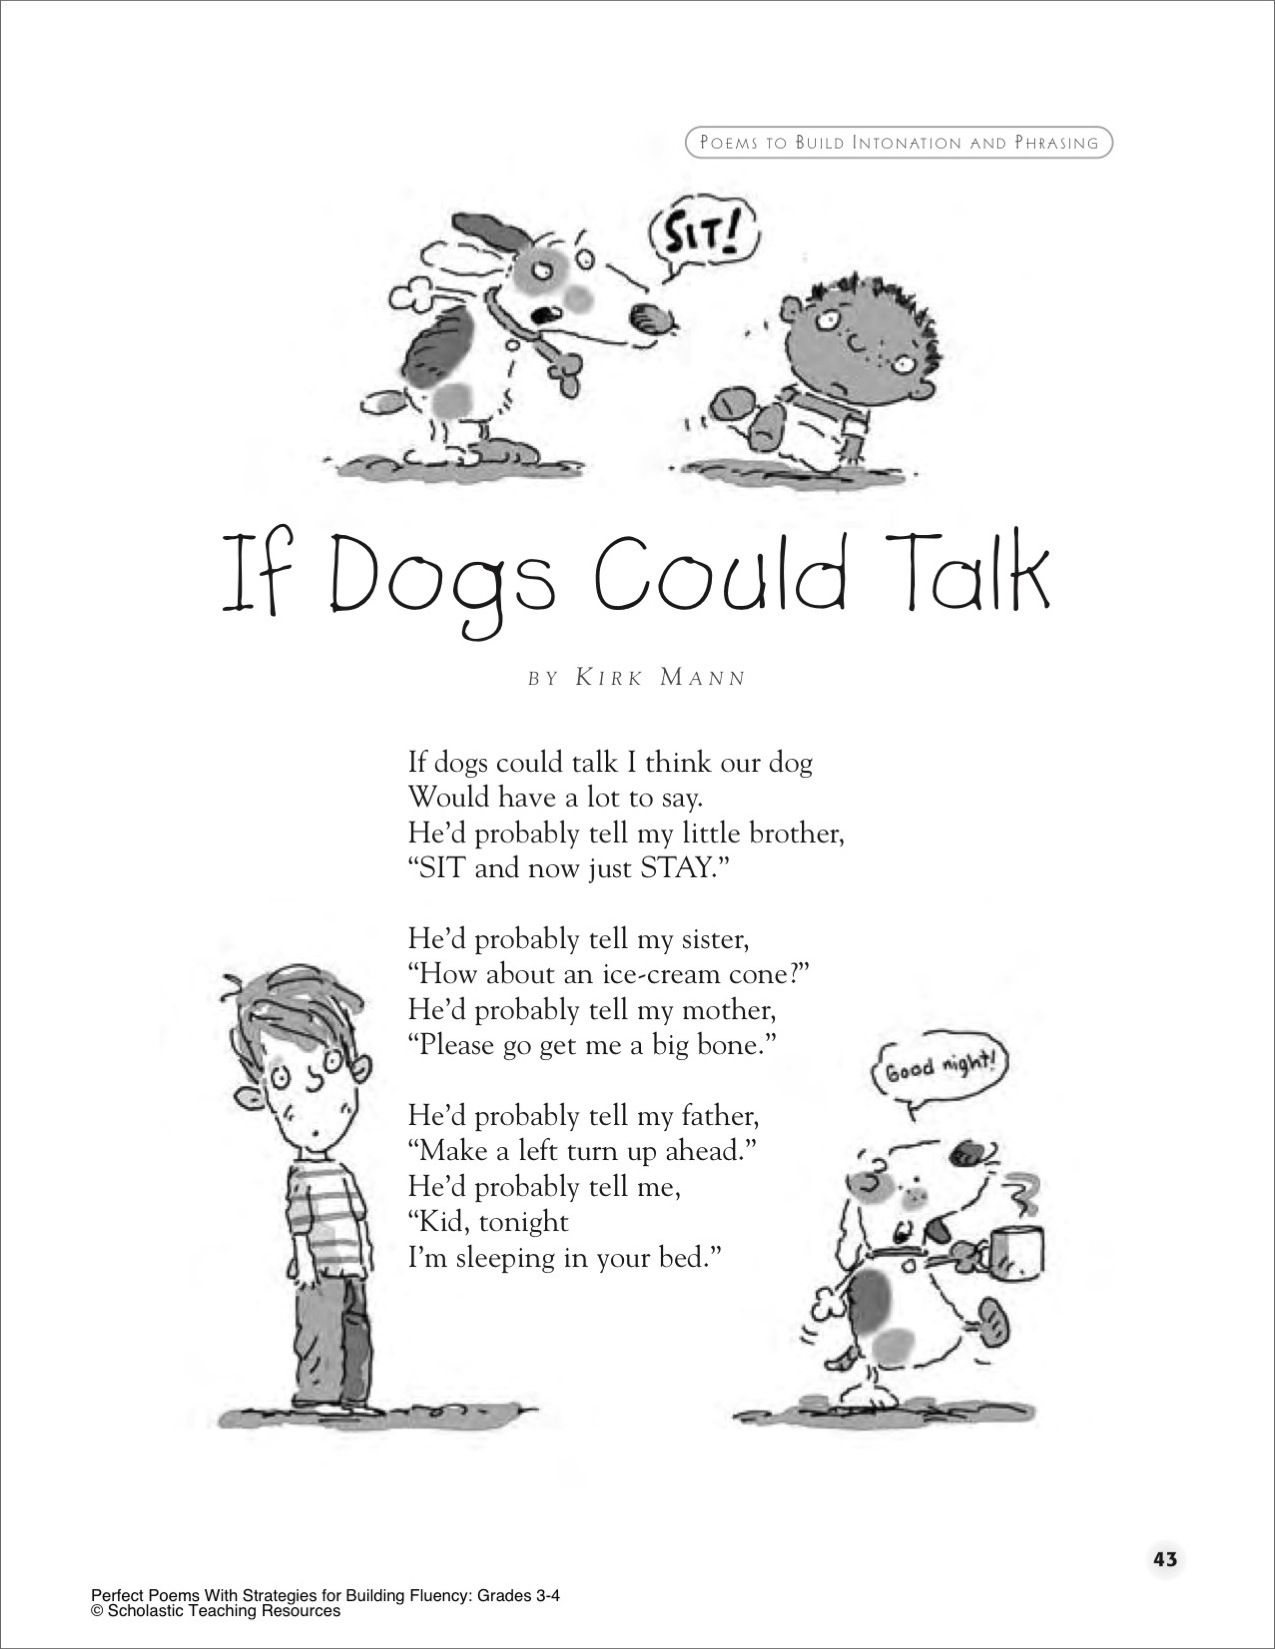 My Doggy Poem for children